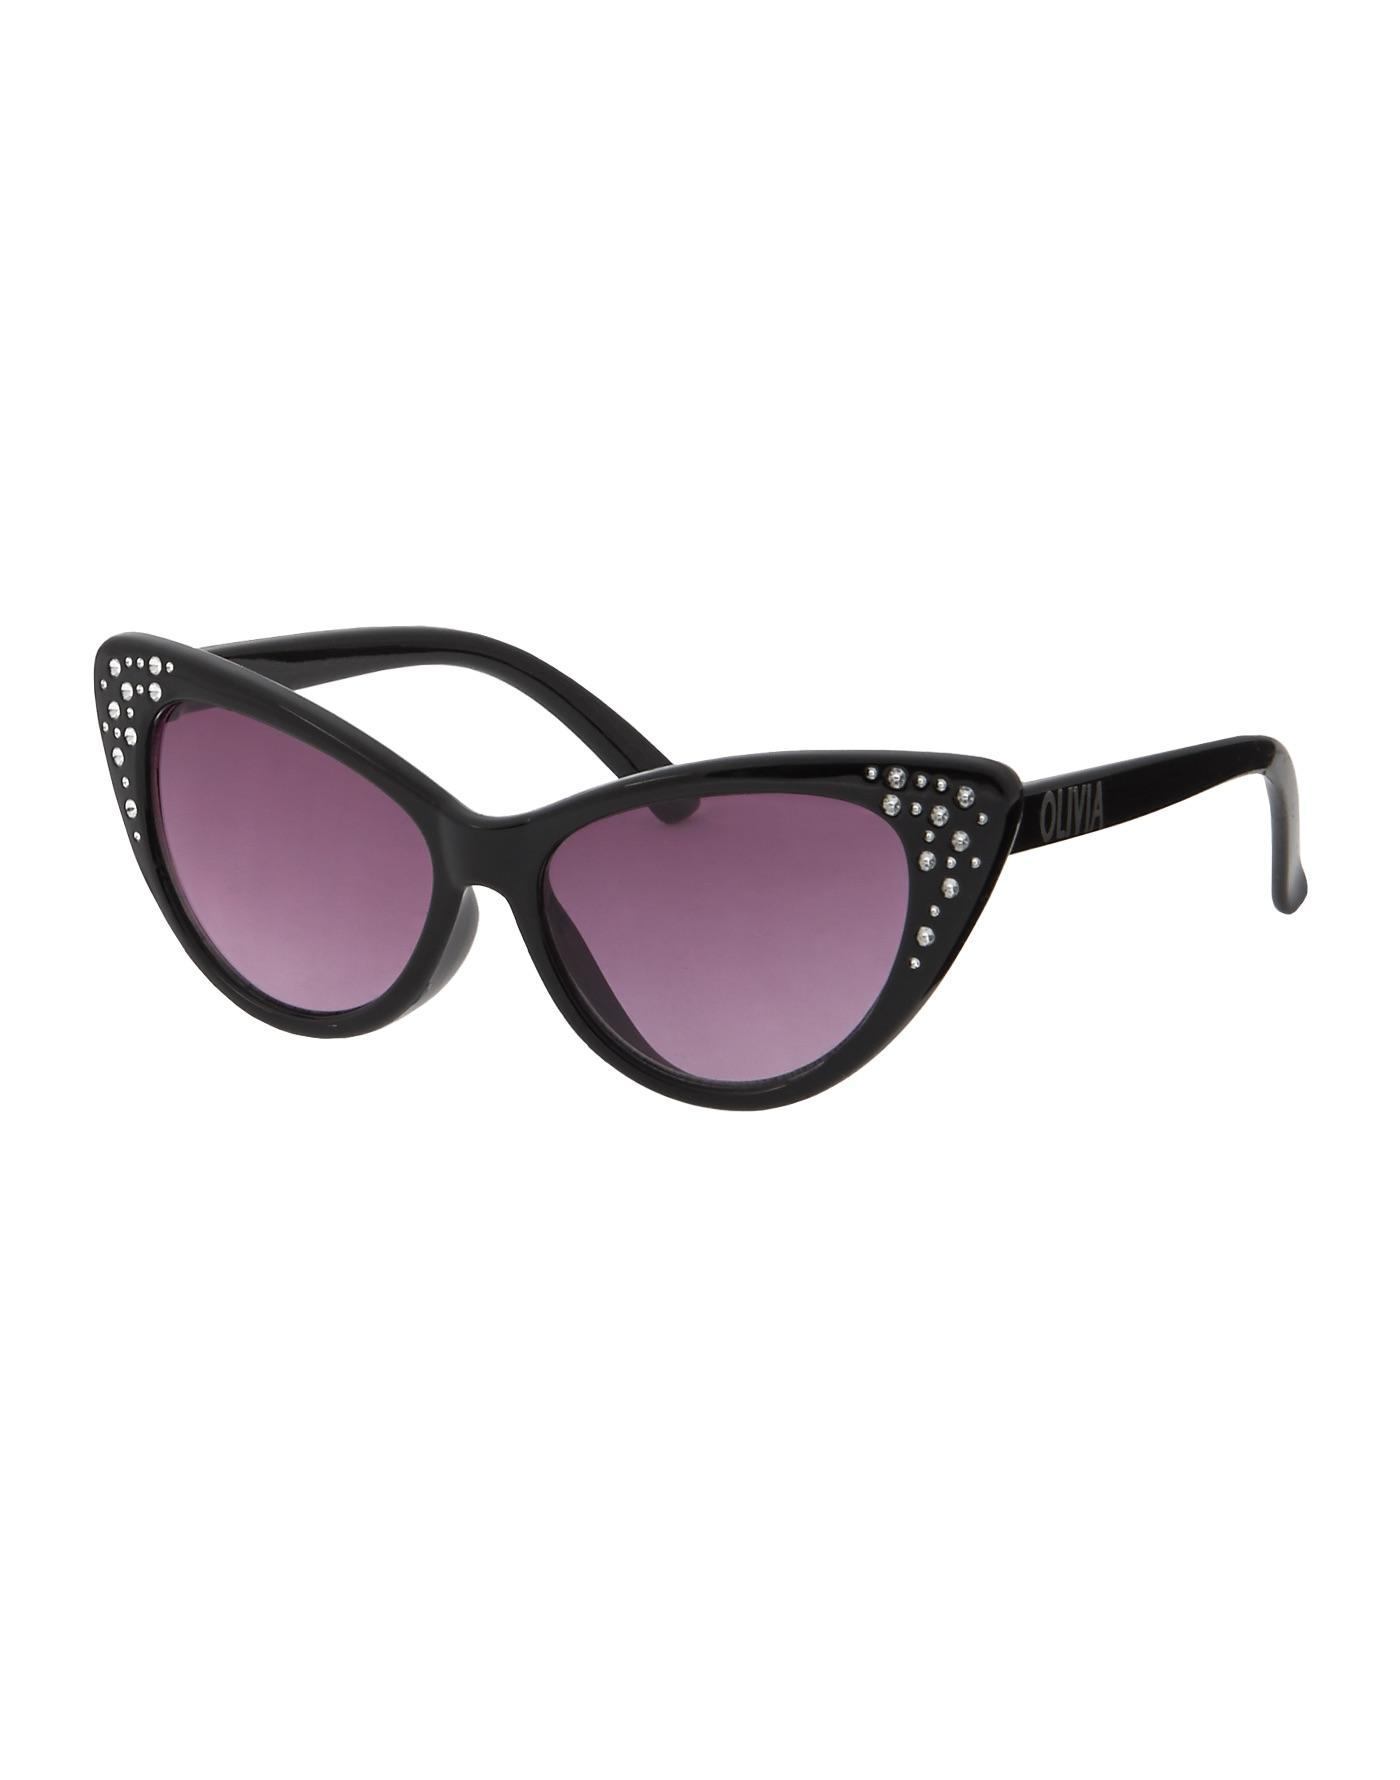 Black Cat Eye Sunglasses.jpg